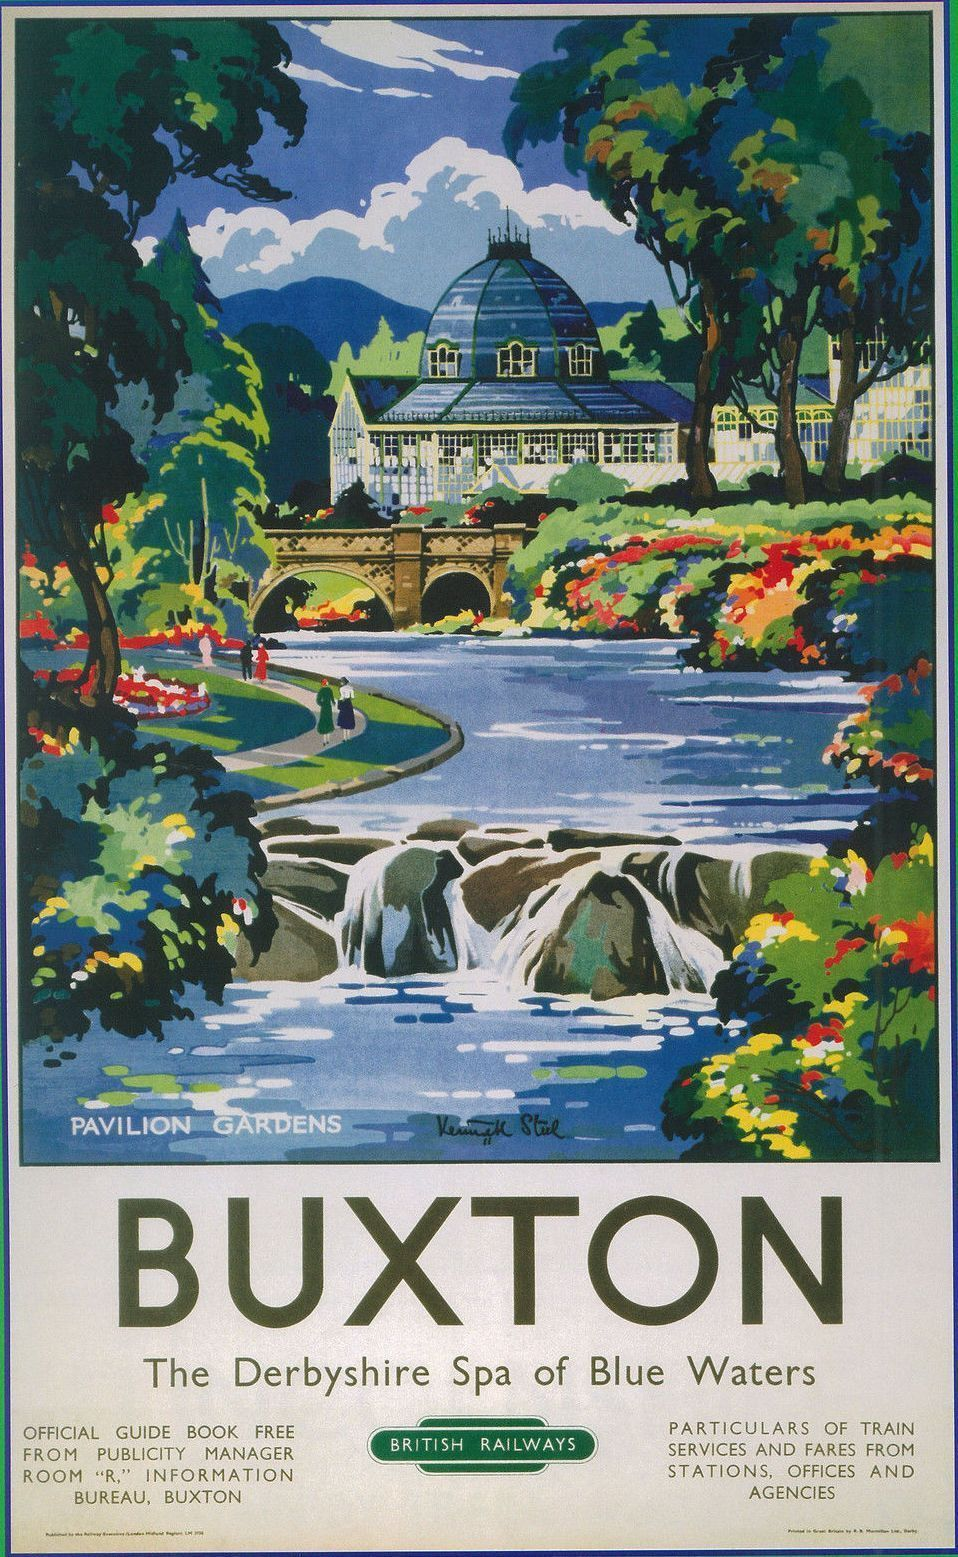 Vintage Transport Railway Rail Travel Advertising Poster Re Print Buxton Travel Posters Railway Posters Retro Travel Poster